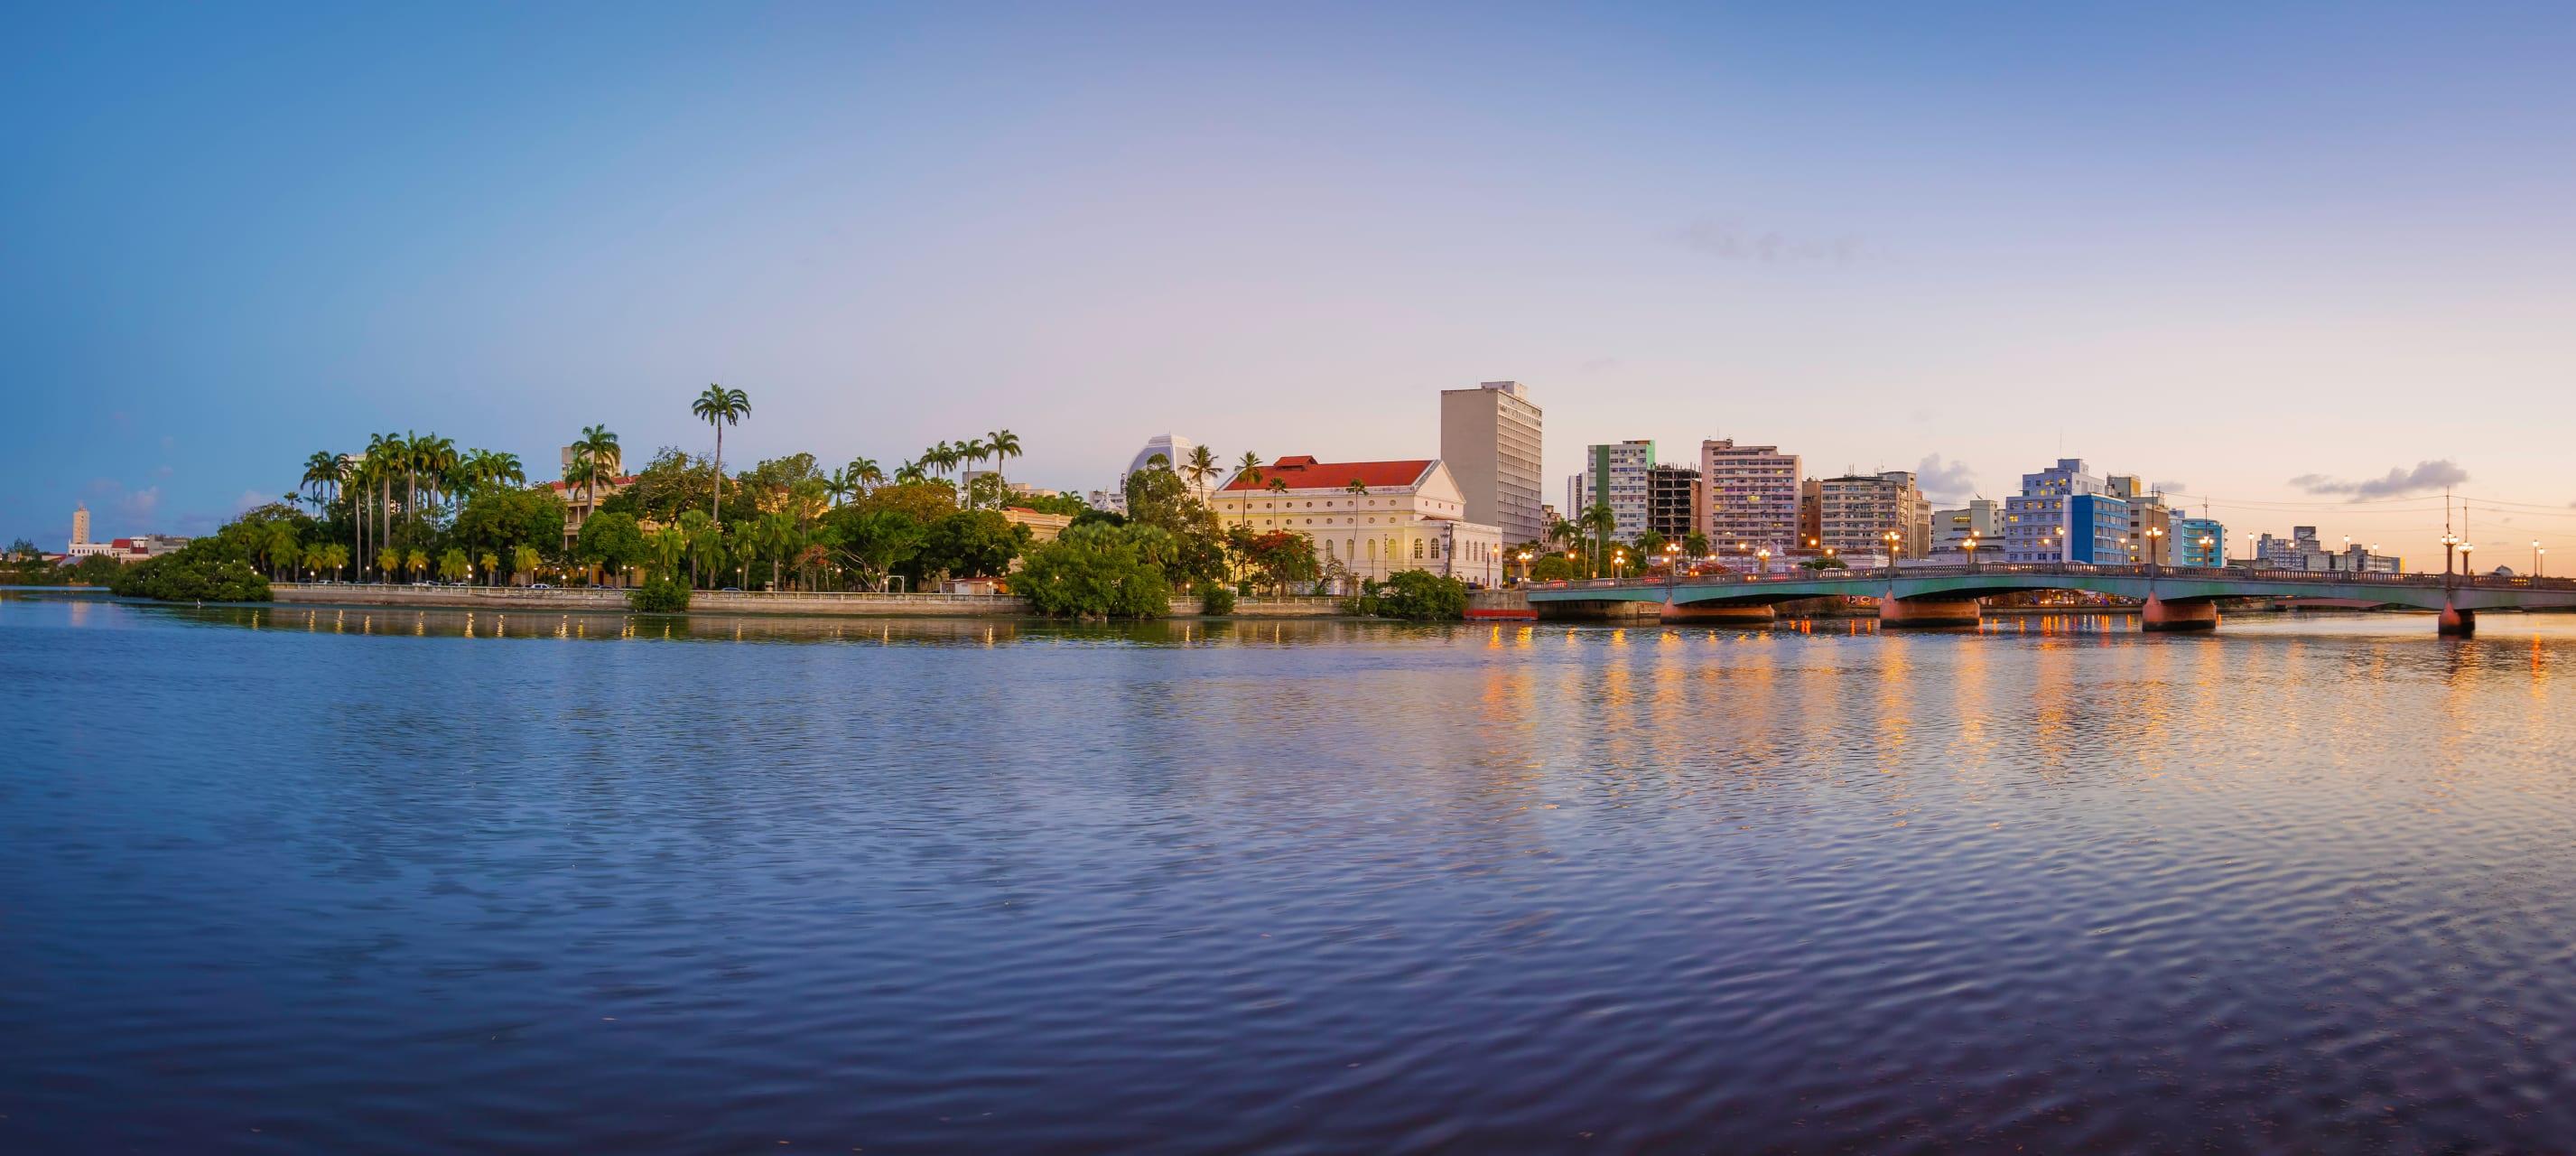 Recife cover image